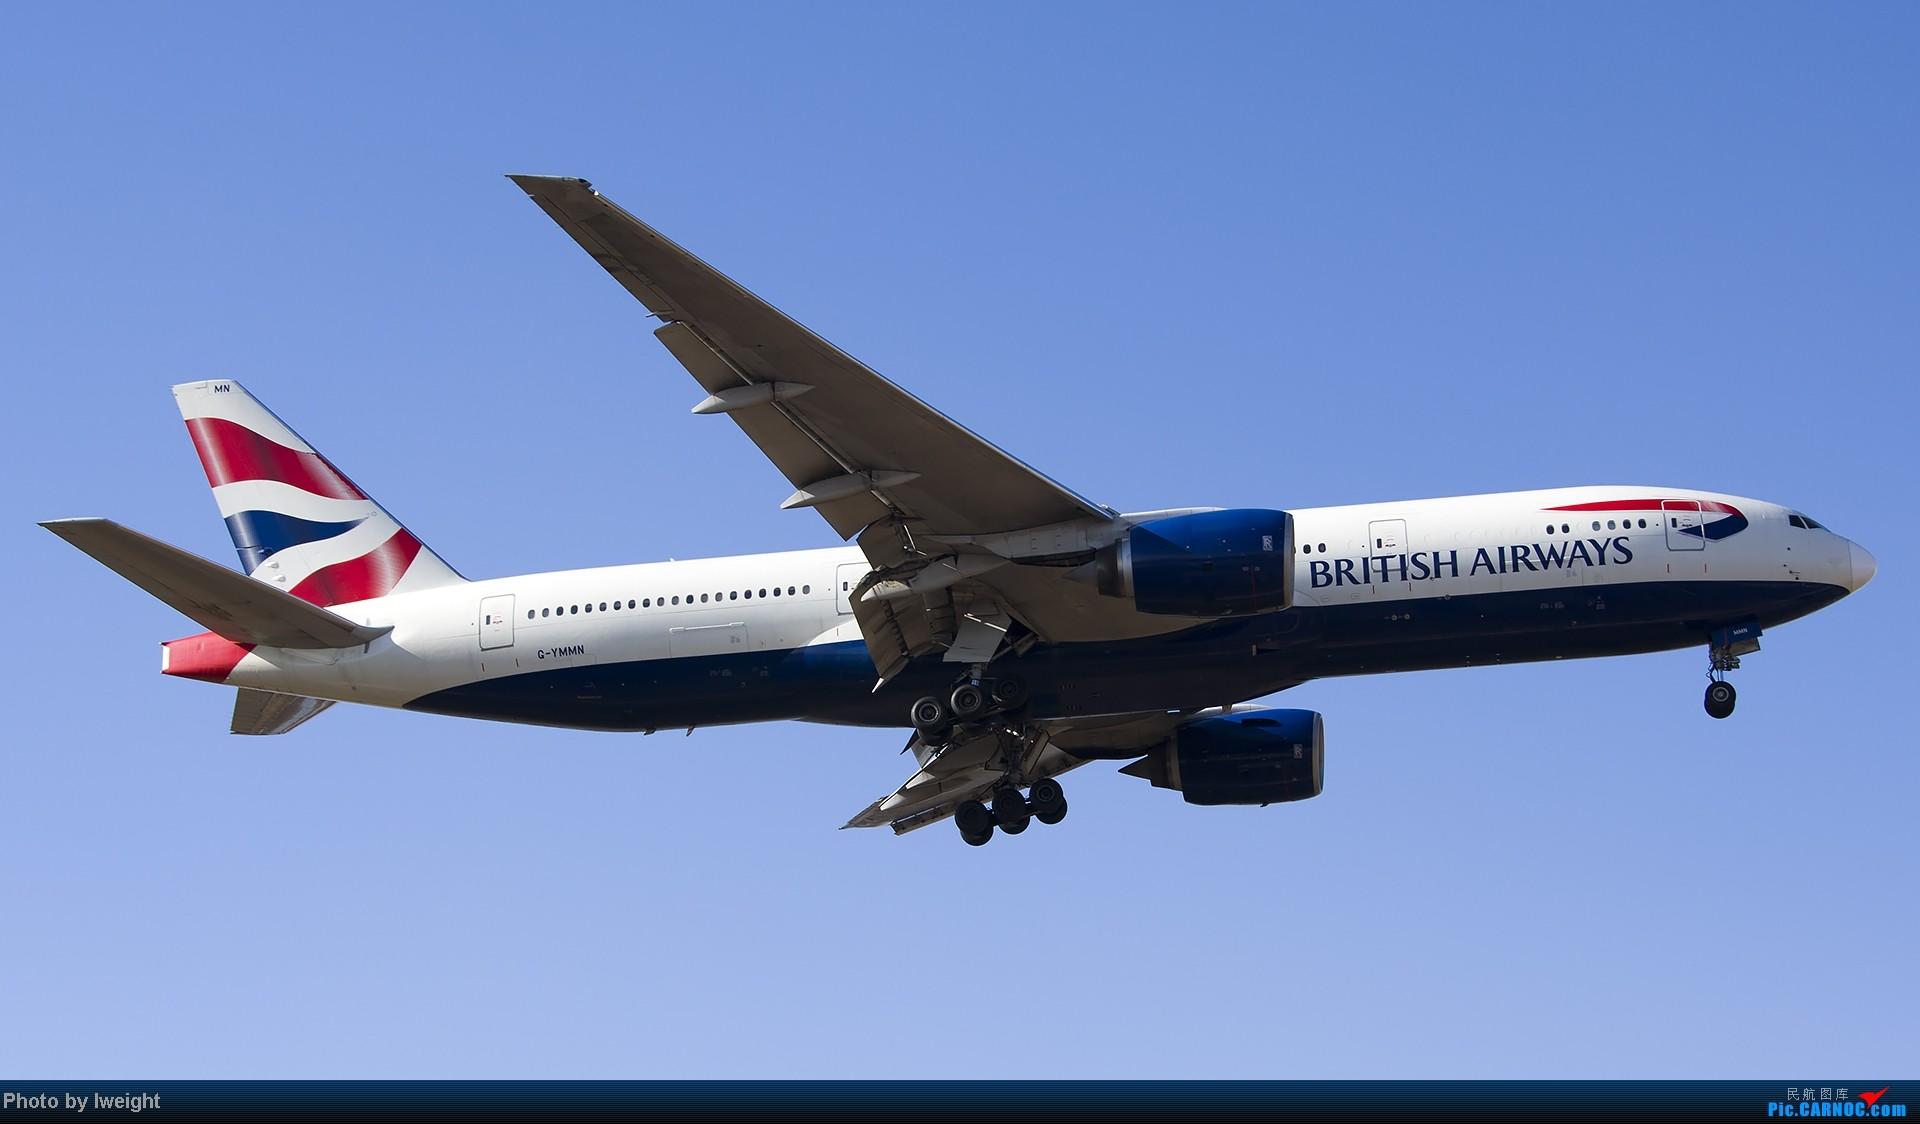 Re:[原创]抓住APEC蓝的尾巴,再拍上一组 BOEING 777-200ER G-YMMN 中国北京首都机场